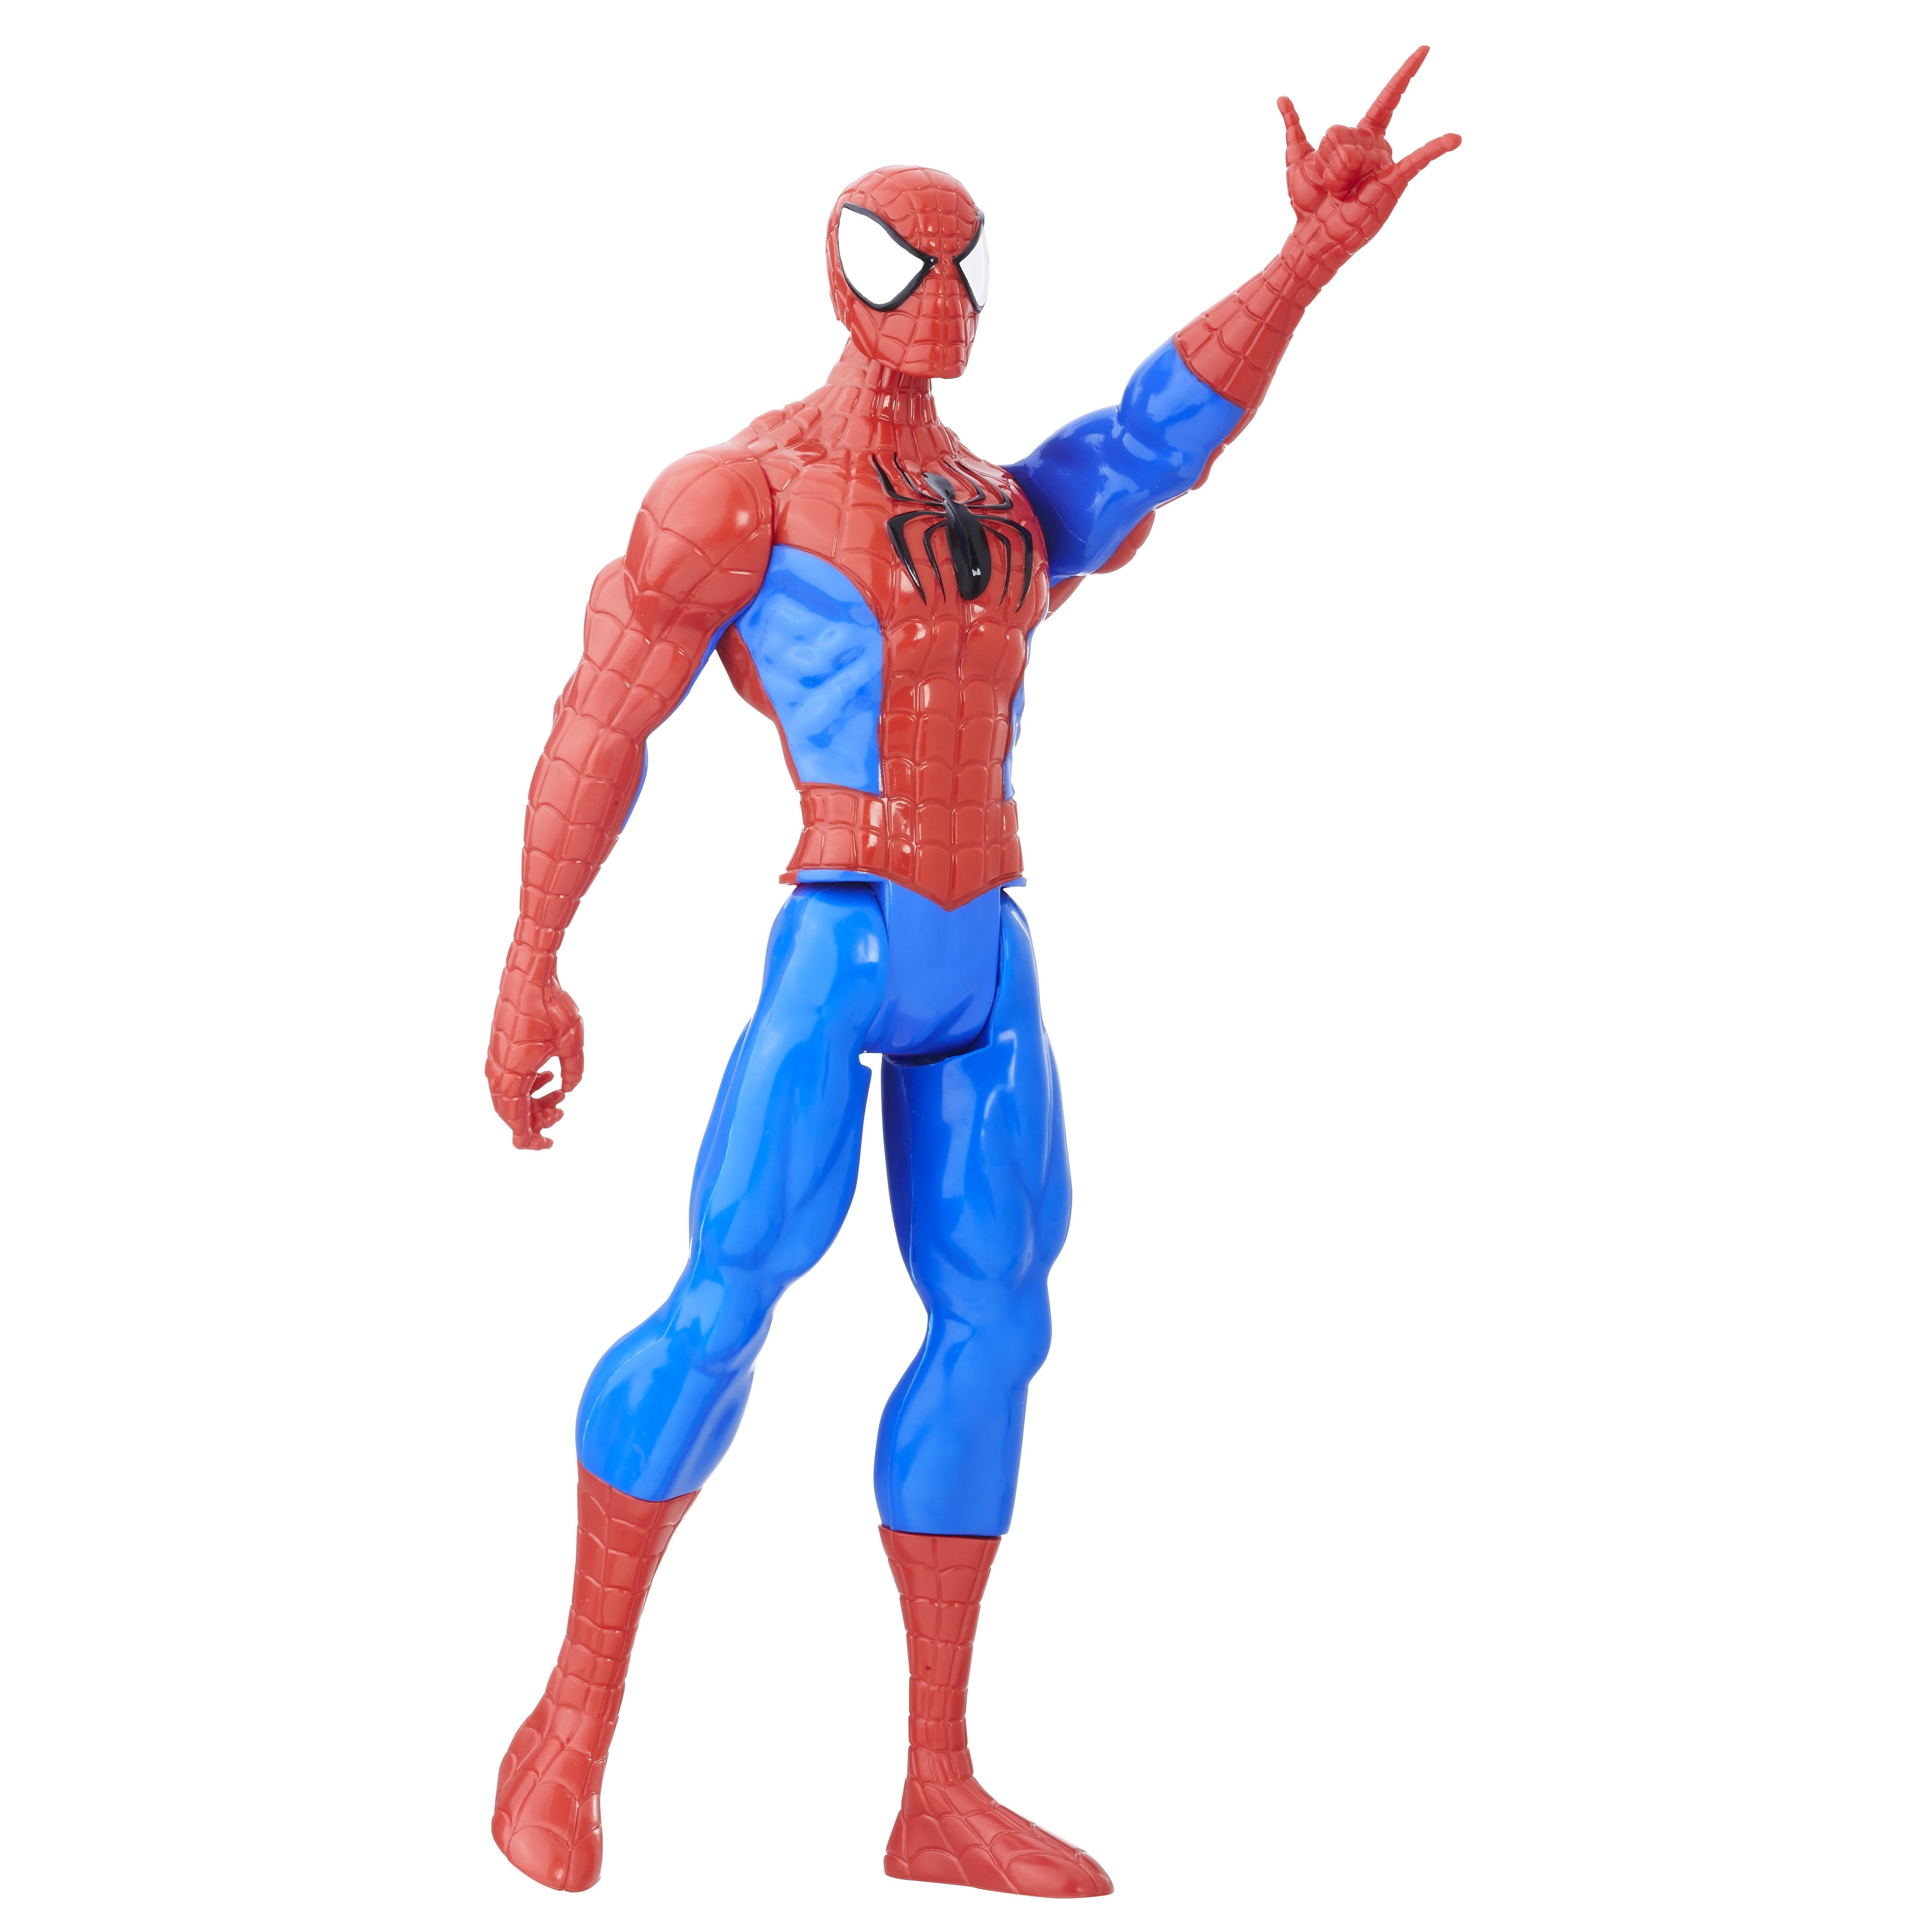 Spider Man Spider-man Титаны: Человек-паук hasbro фигурка с транспортным средством marvel spider man человек паук на мотоцикле